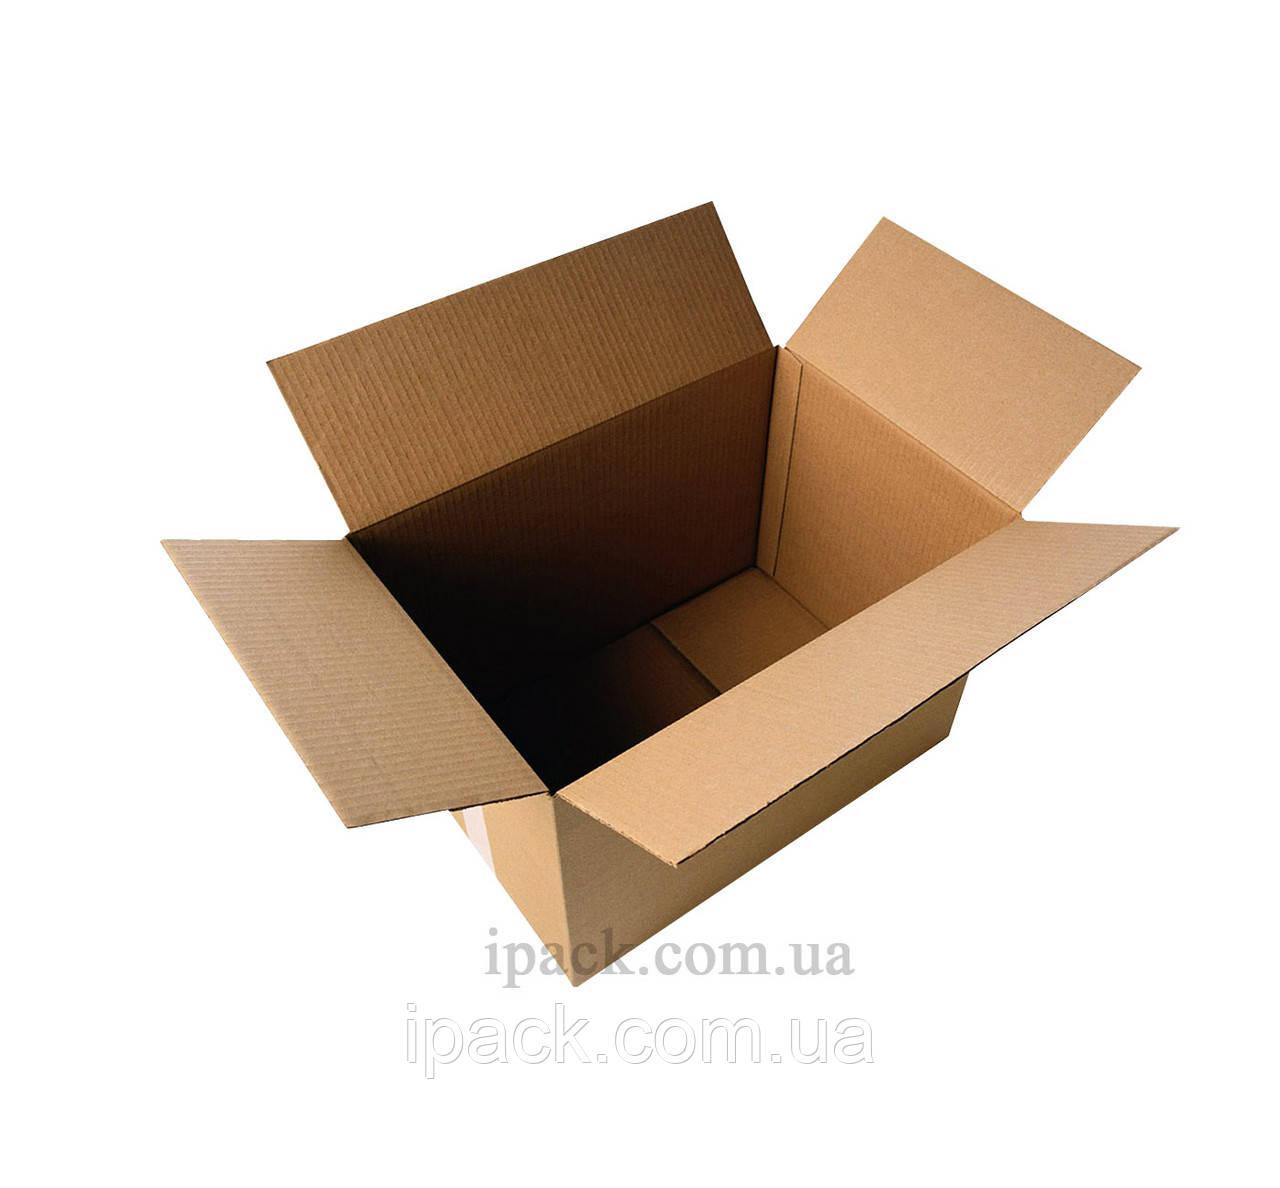 Гофроящик 260*195*295 мм, бурый, четырехклапанный картонный короб